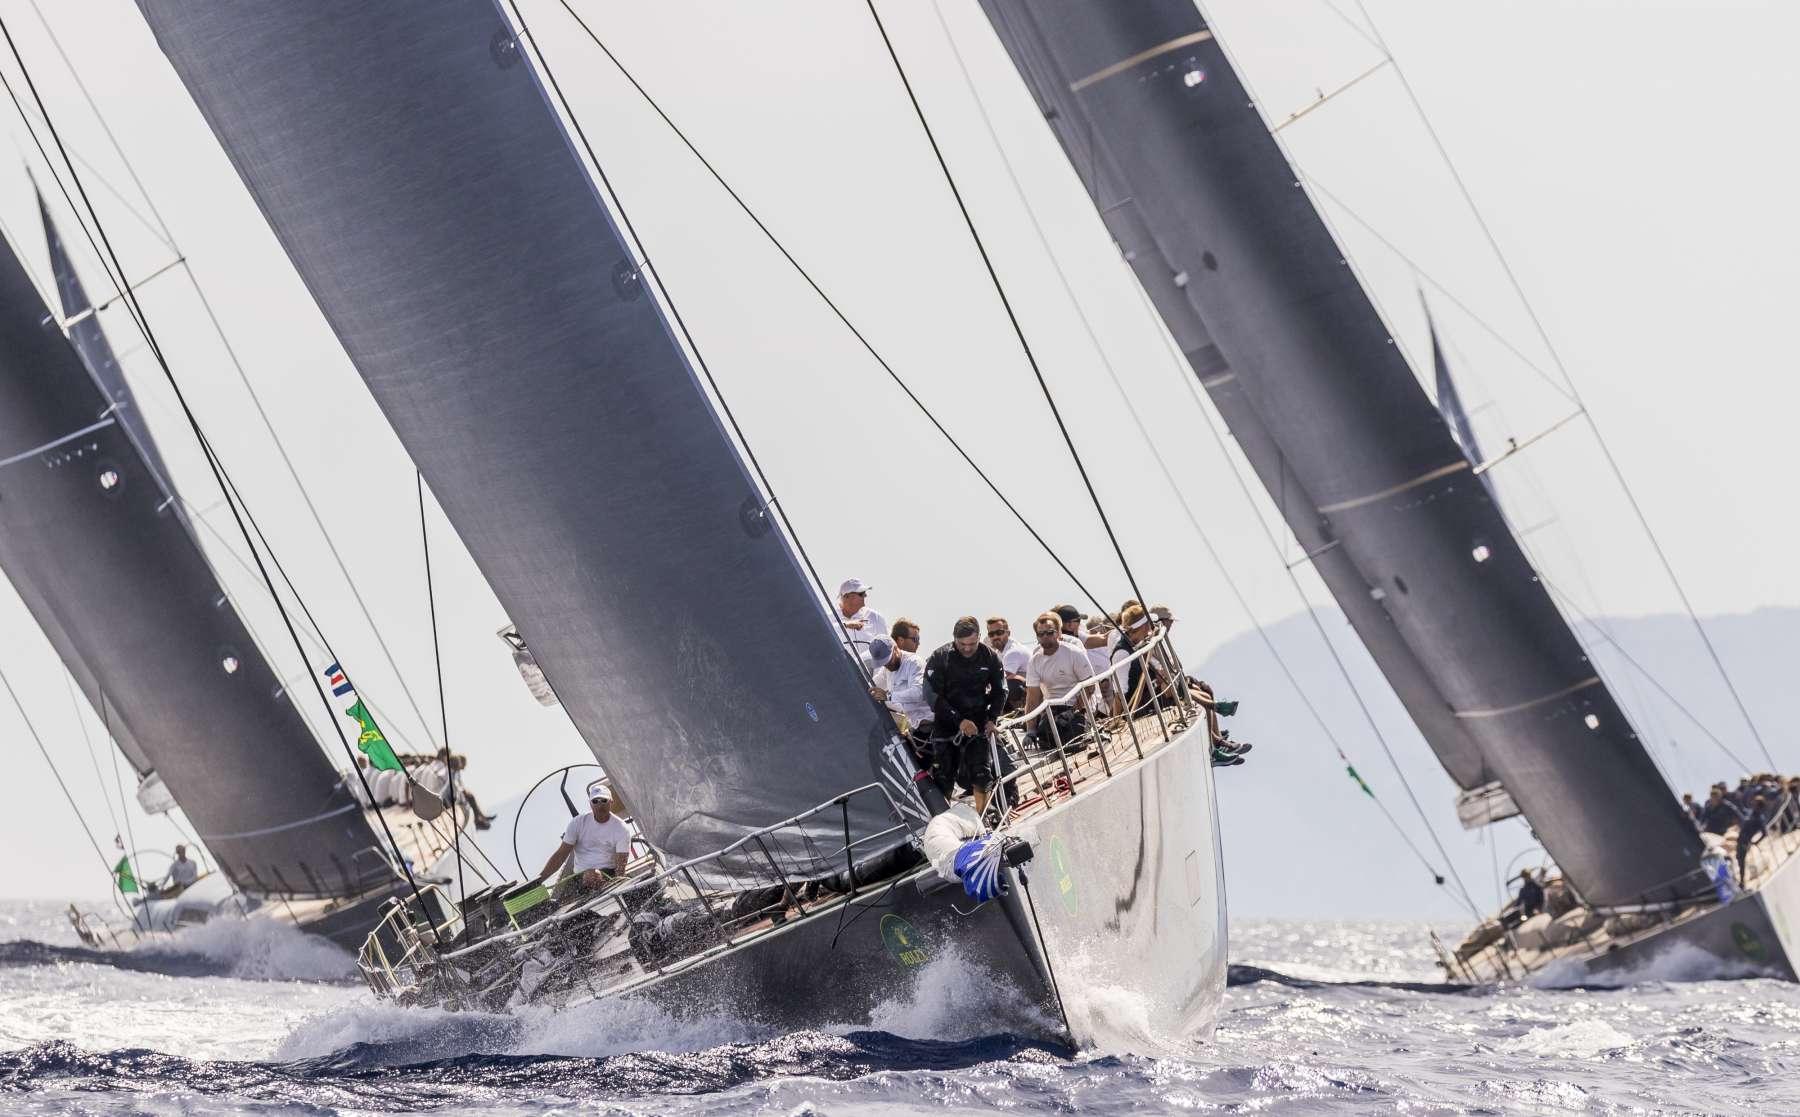 Maxi Yacht Rolex Cup & Rolex Maxi 72 Worlds - Foto Day 3 online - NEWS - Yacht Club Costa Smeralda